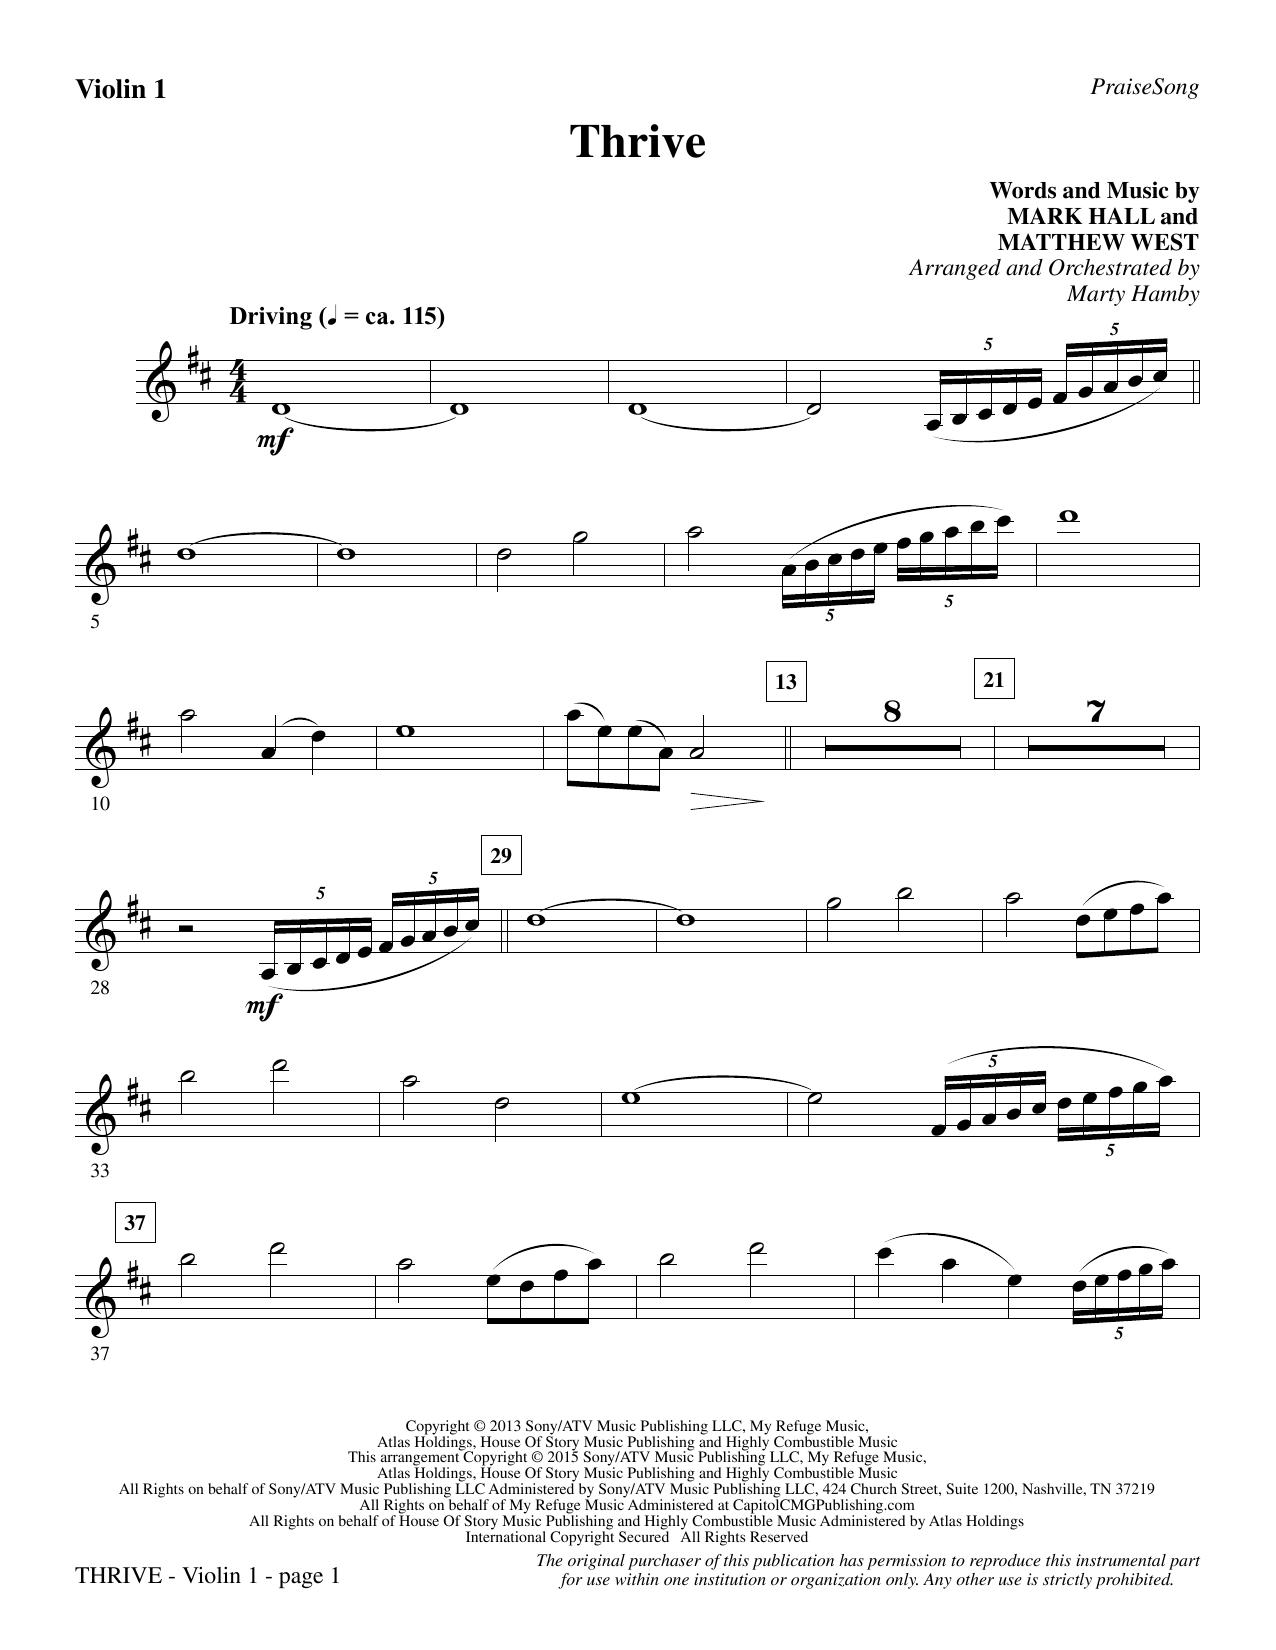 Thrive - Violin 1 sheet music